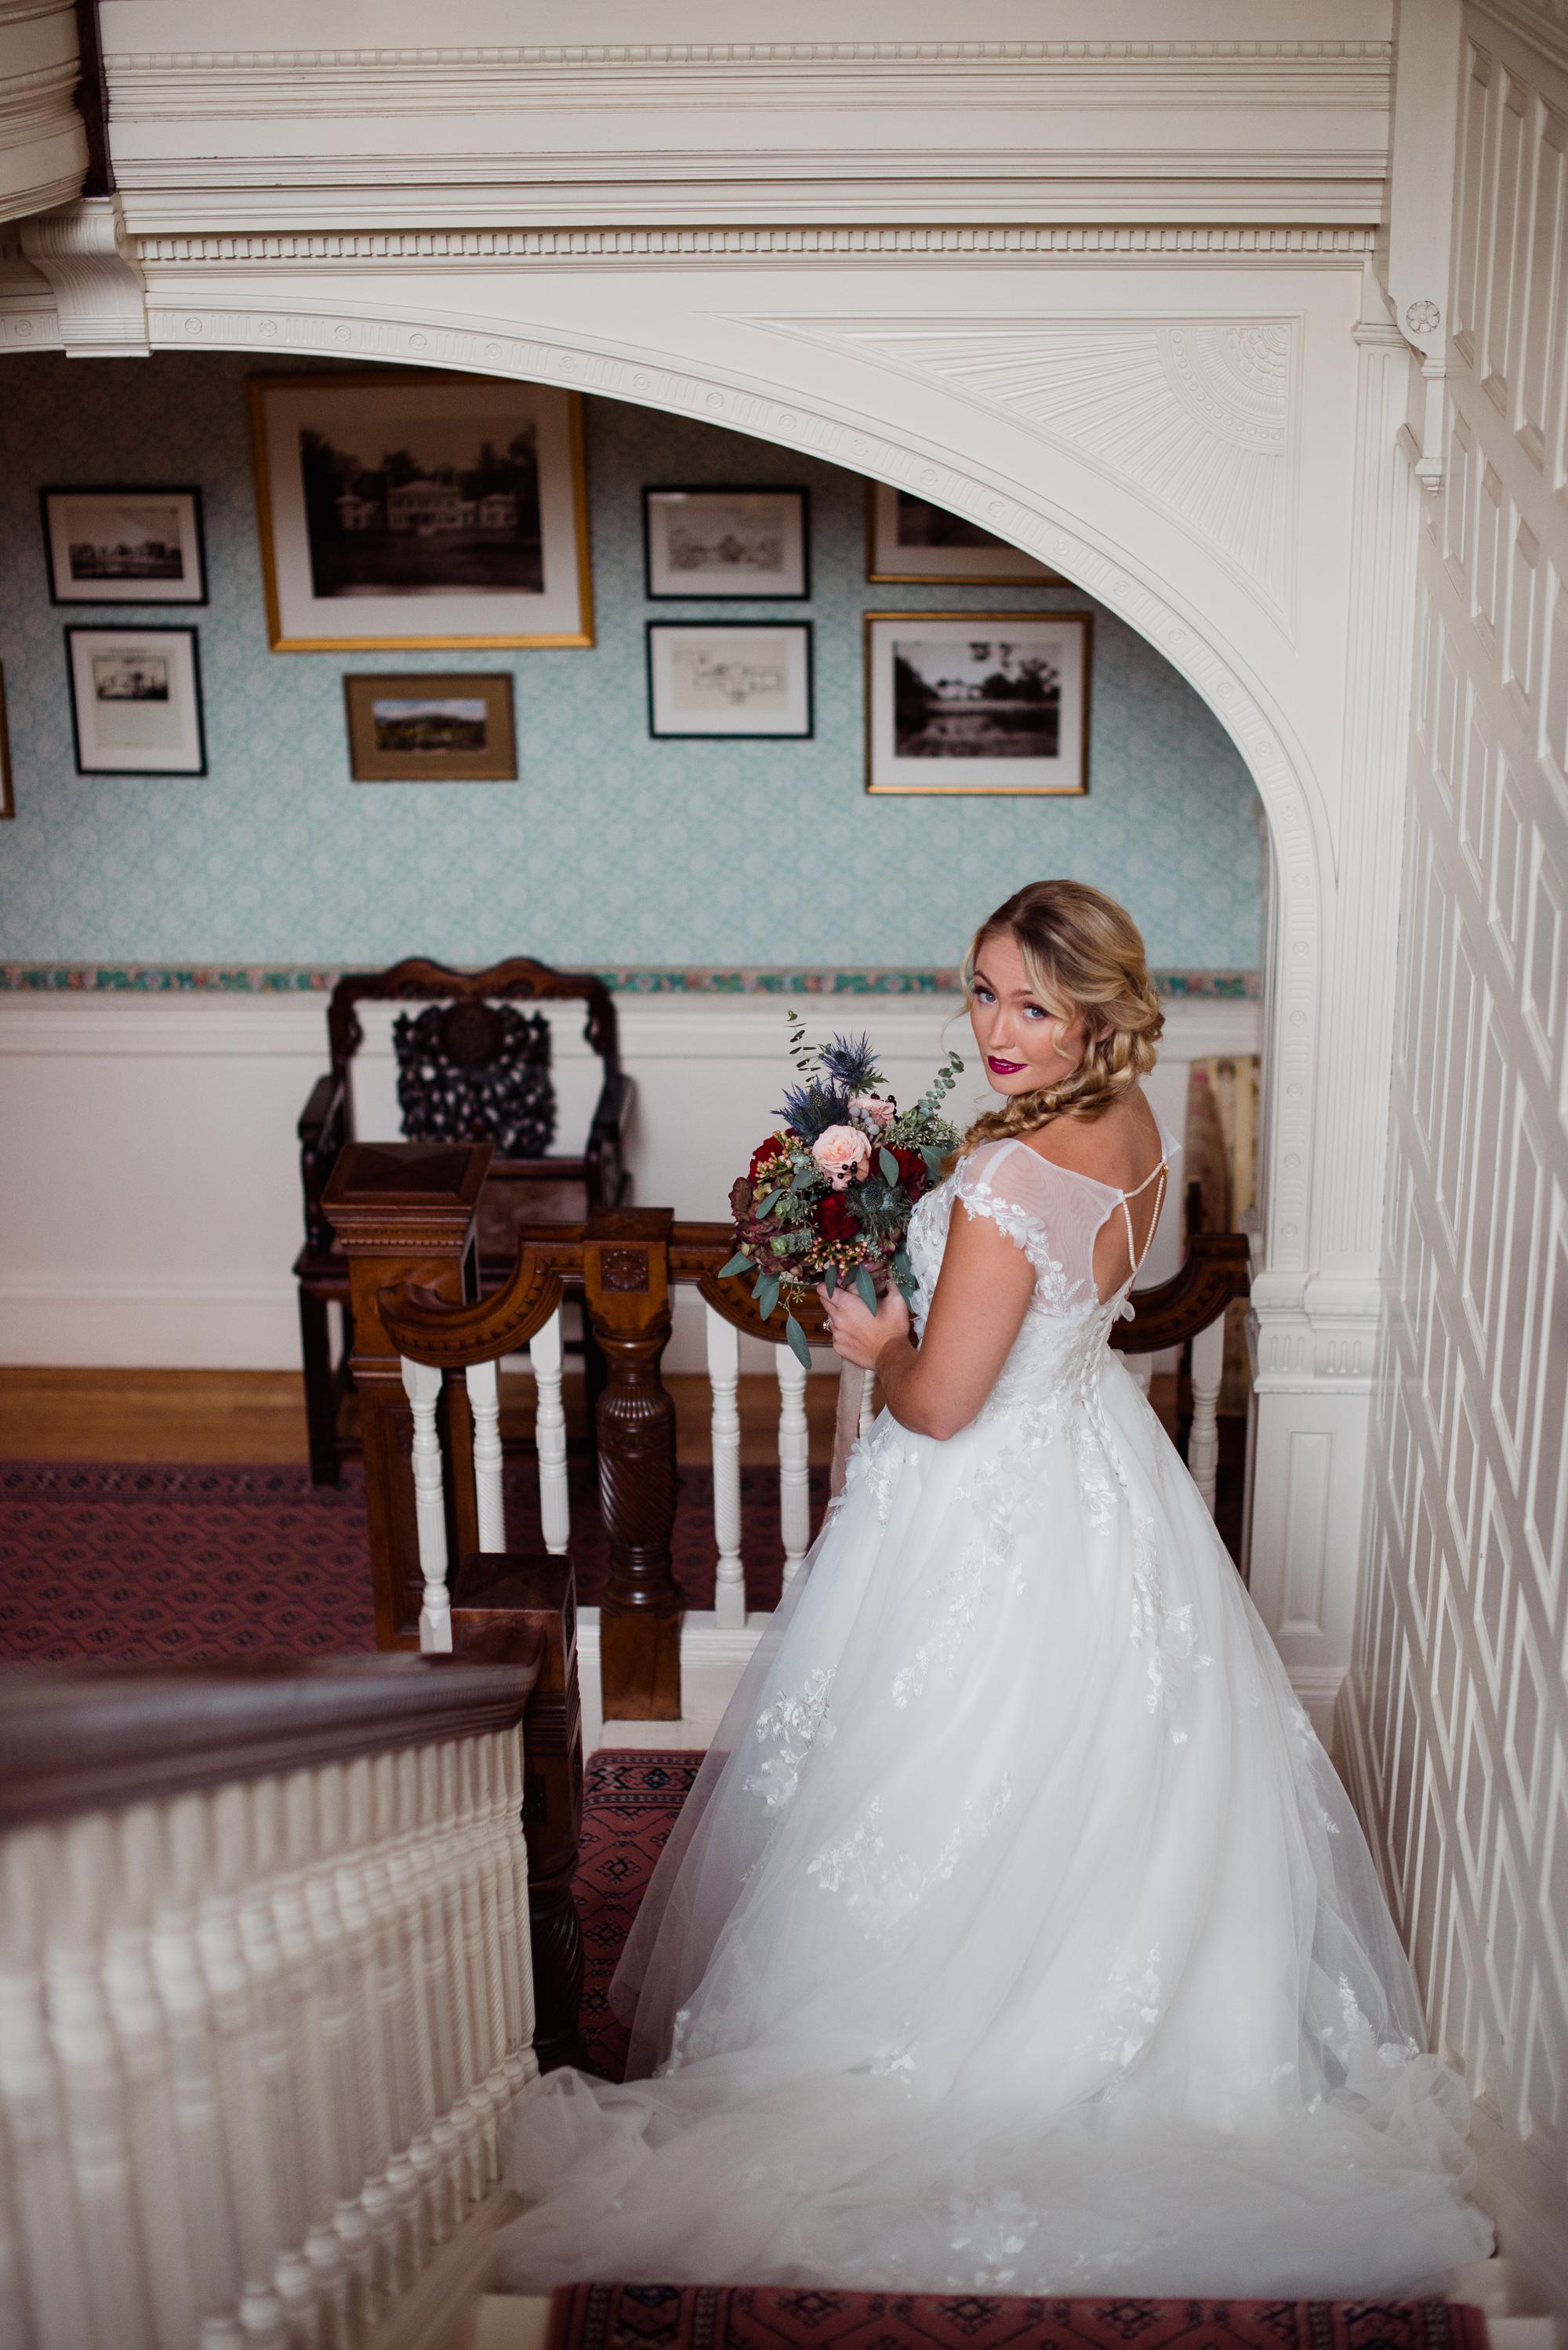 candidi wedding photo idea stairs turning heads